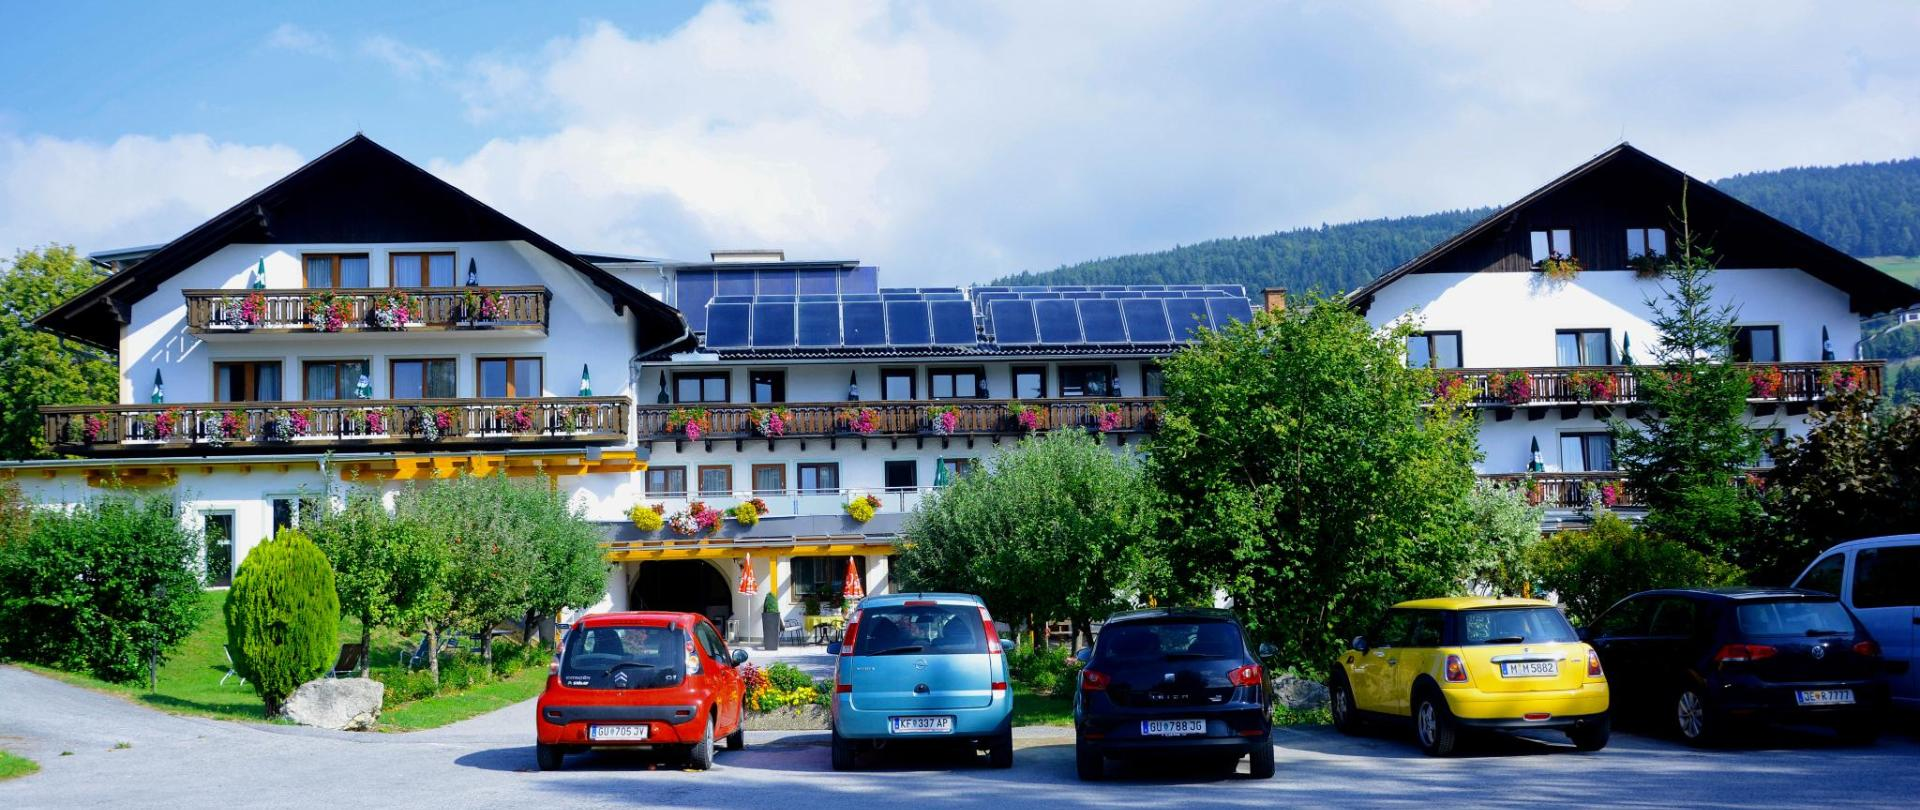 Familienhotel Trattnerhof - Wellness im Grünen